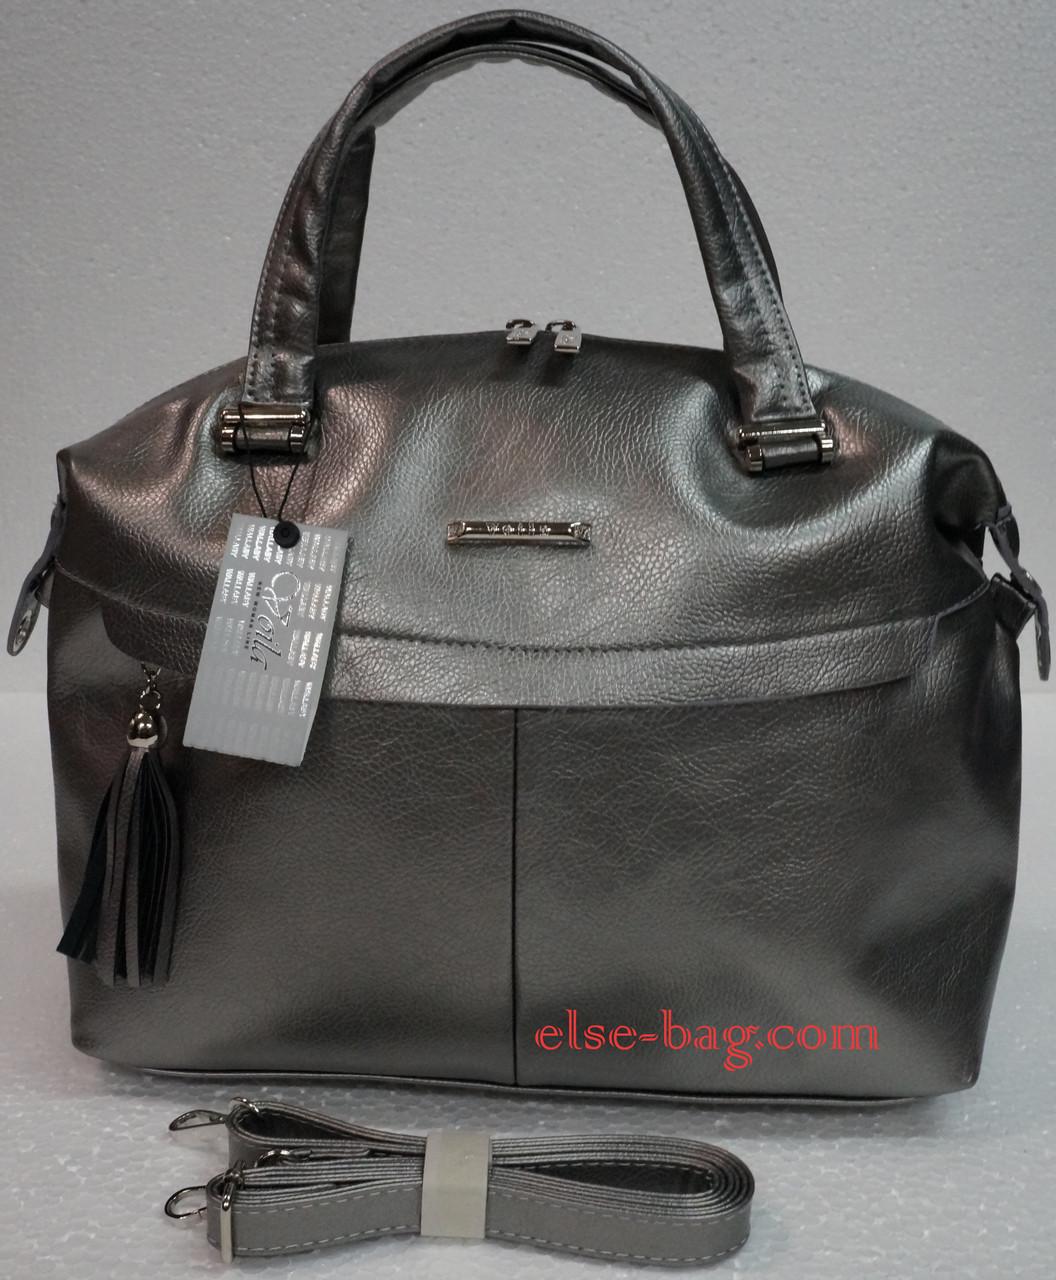 c5e2d269a252 Женская сумка саквояж с передним карманов на кокетке -